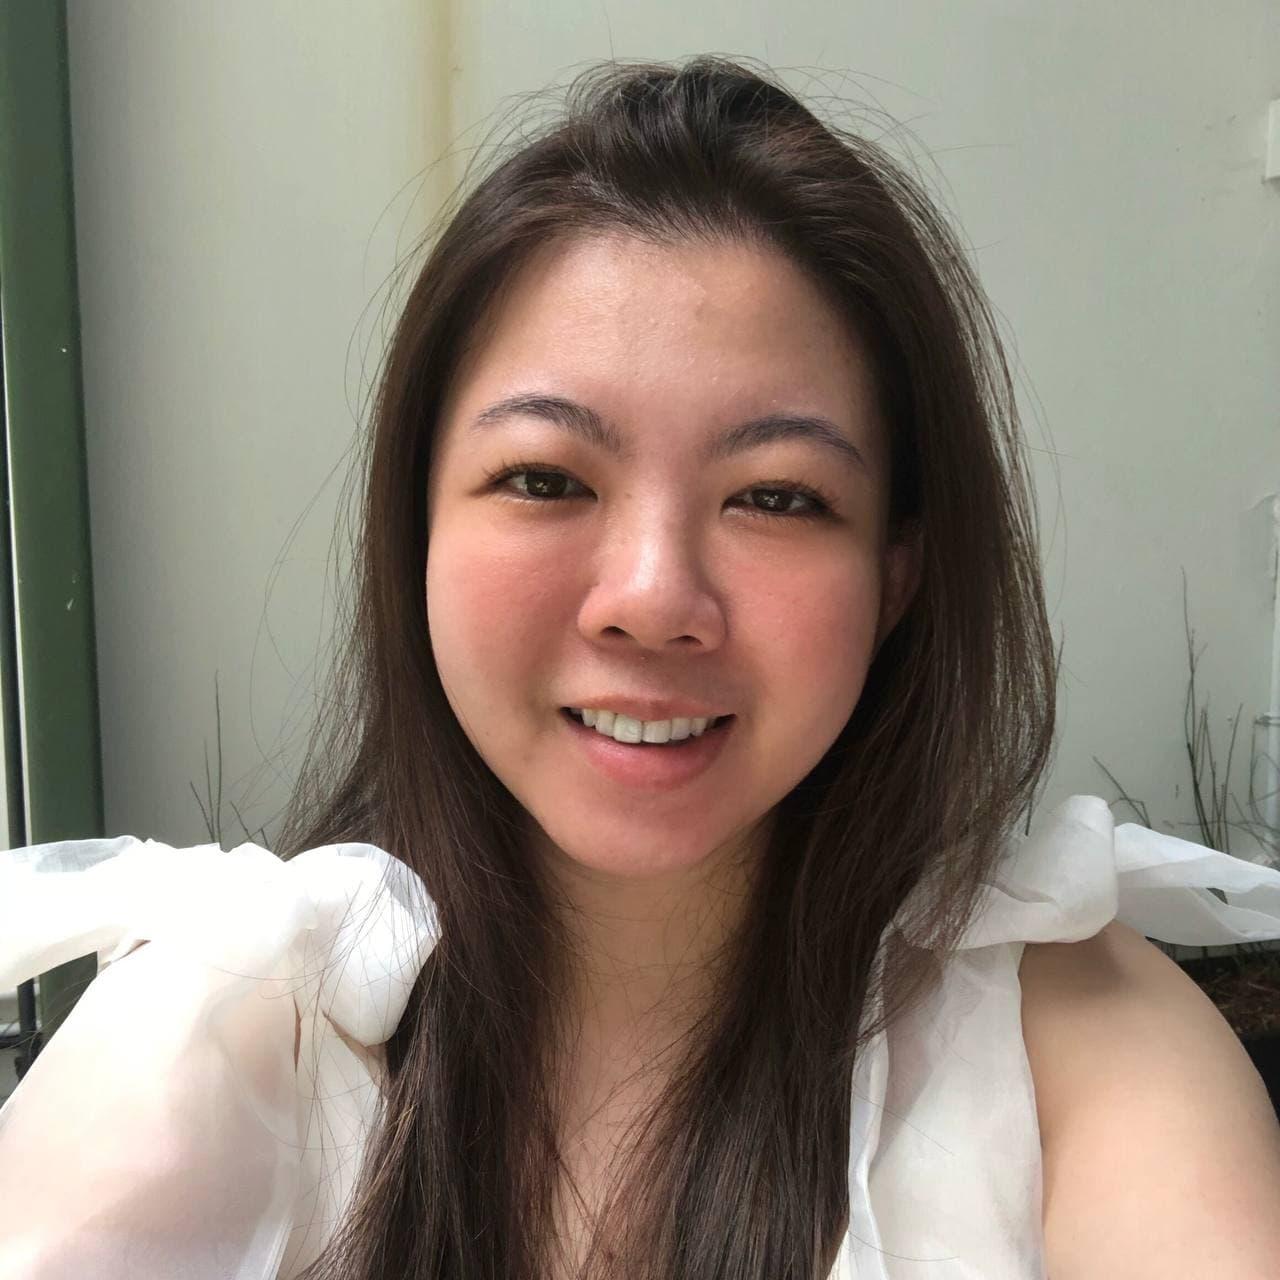 shakura - with makeup on